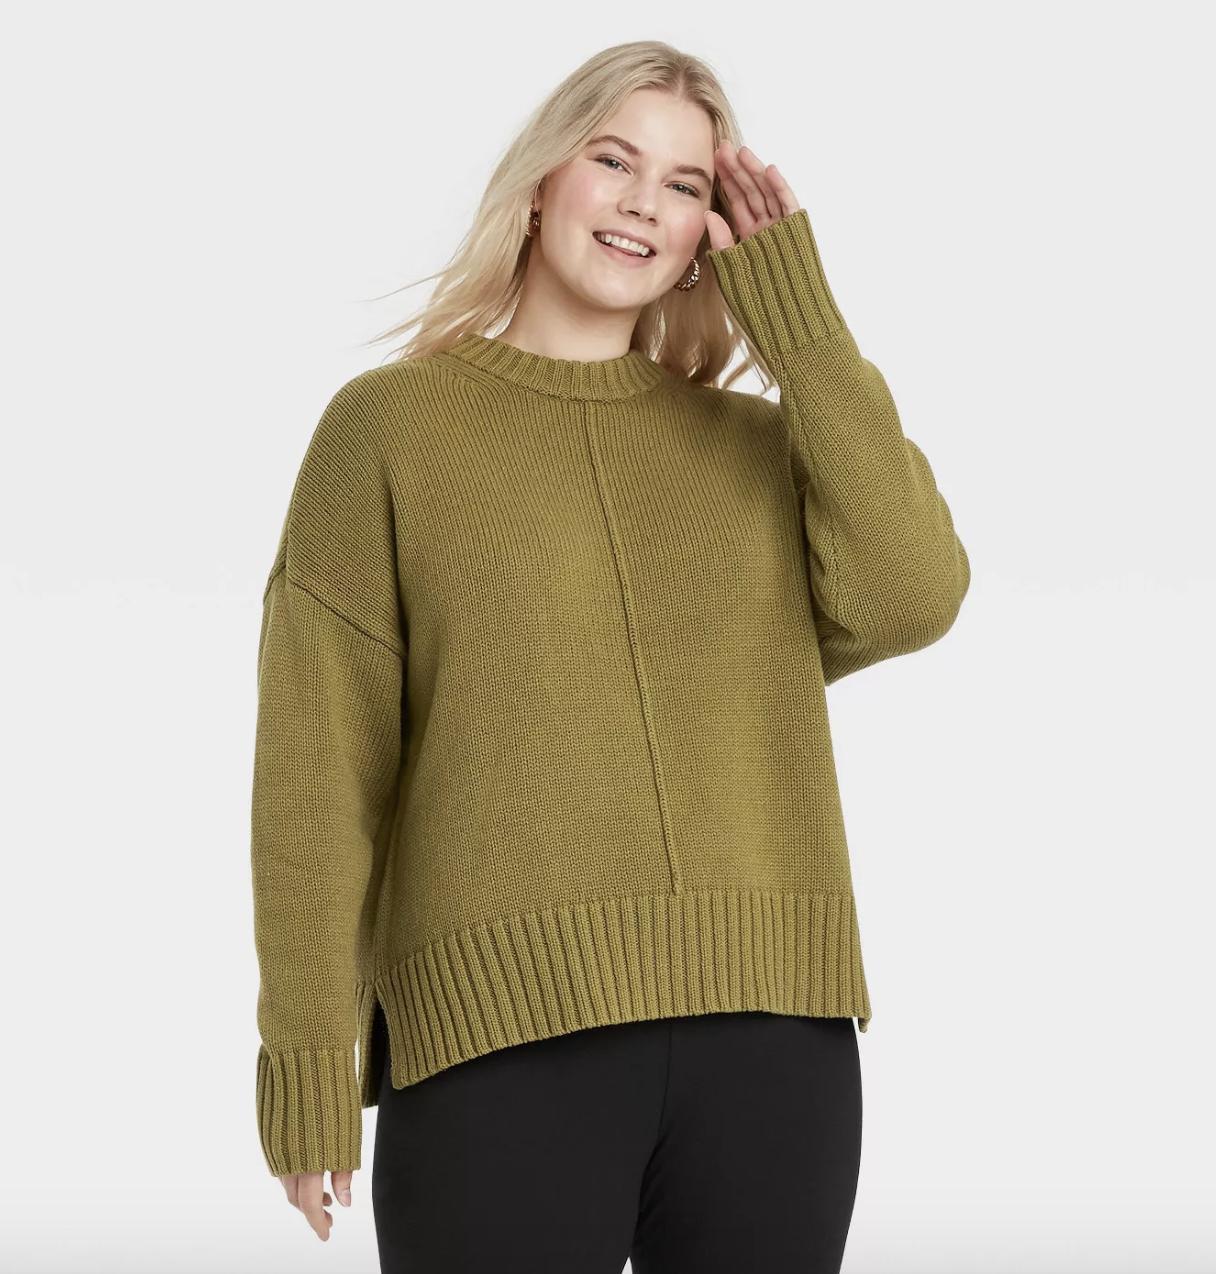 model wearing the light green sweater